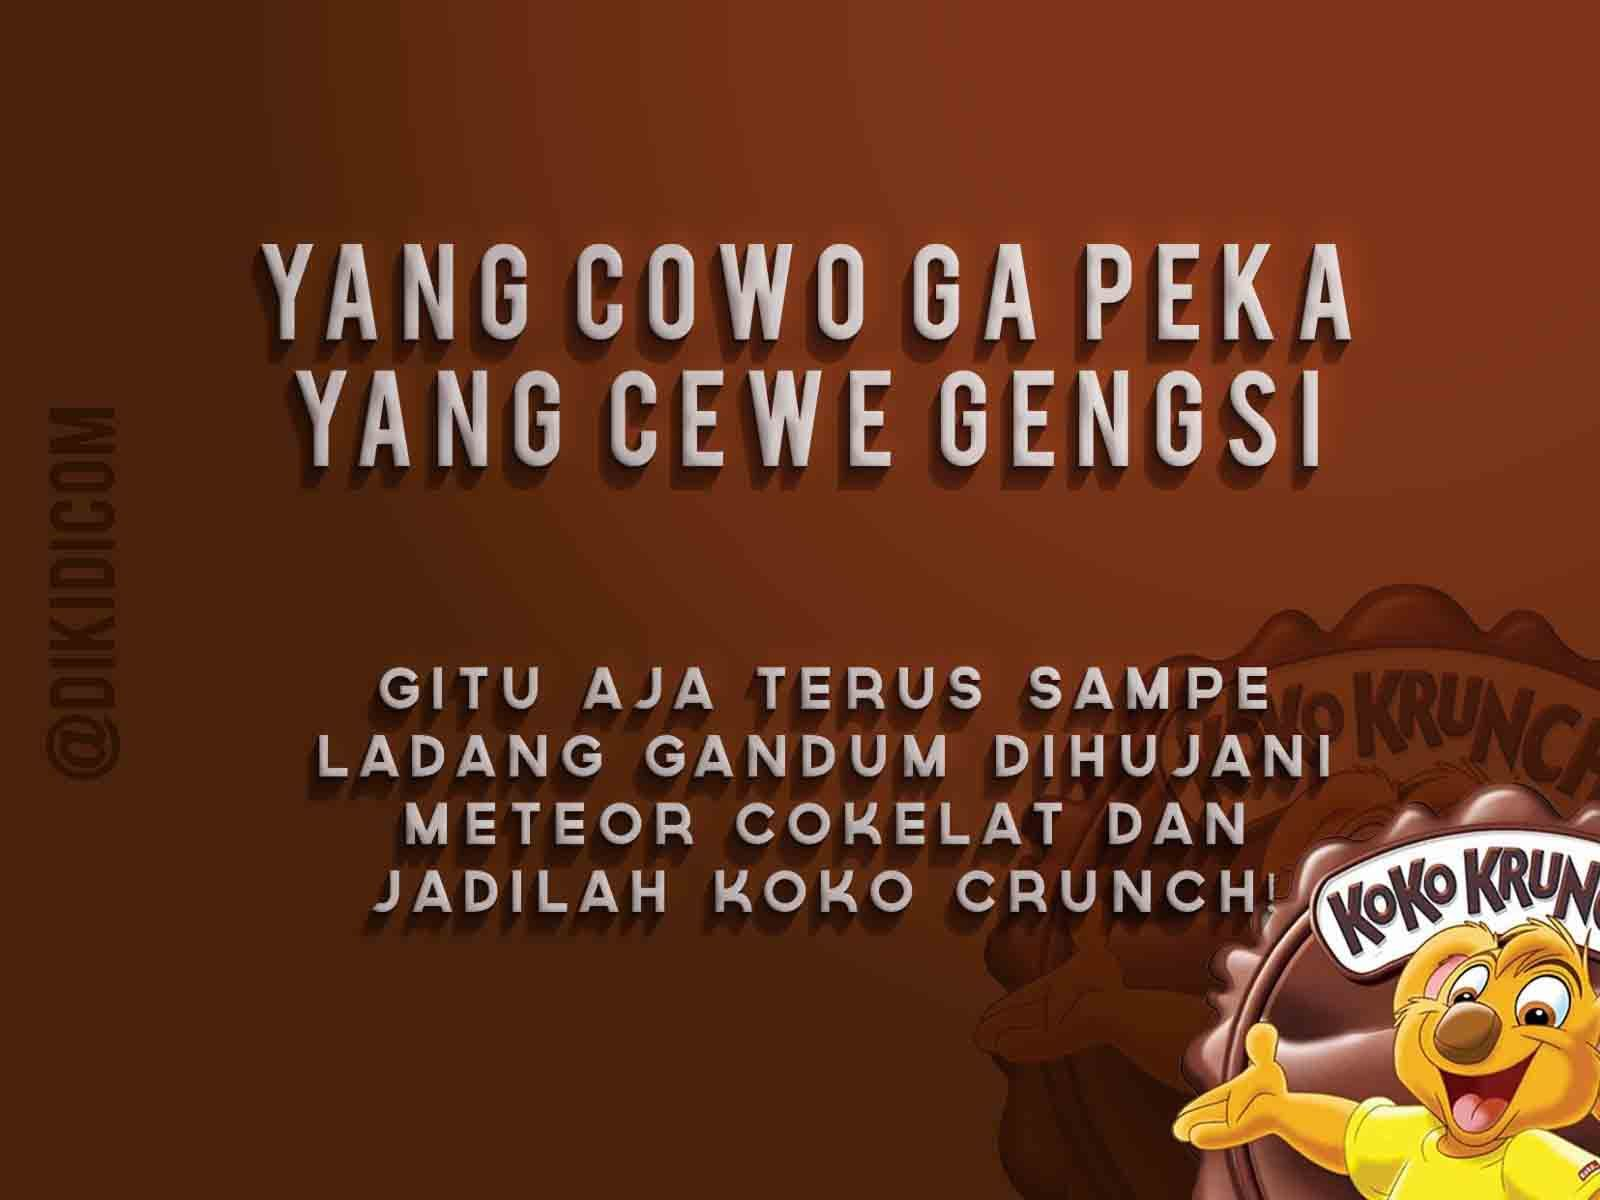 Nyesek Itu Ketika Meme Indonesia Pinterest Itu